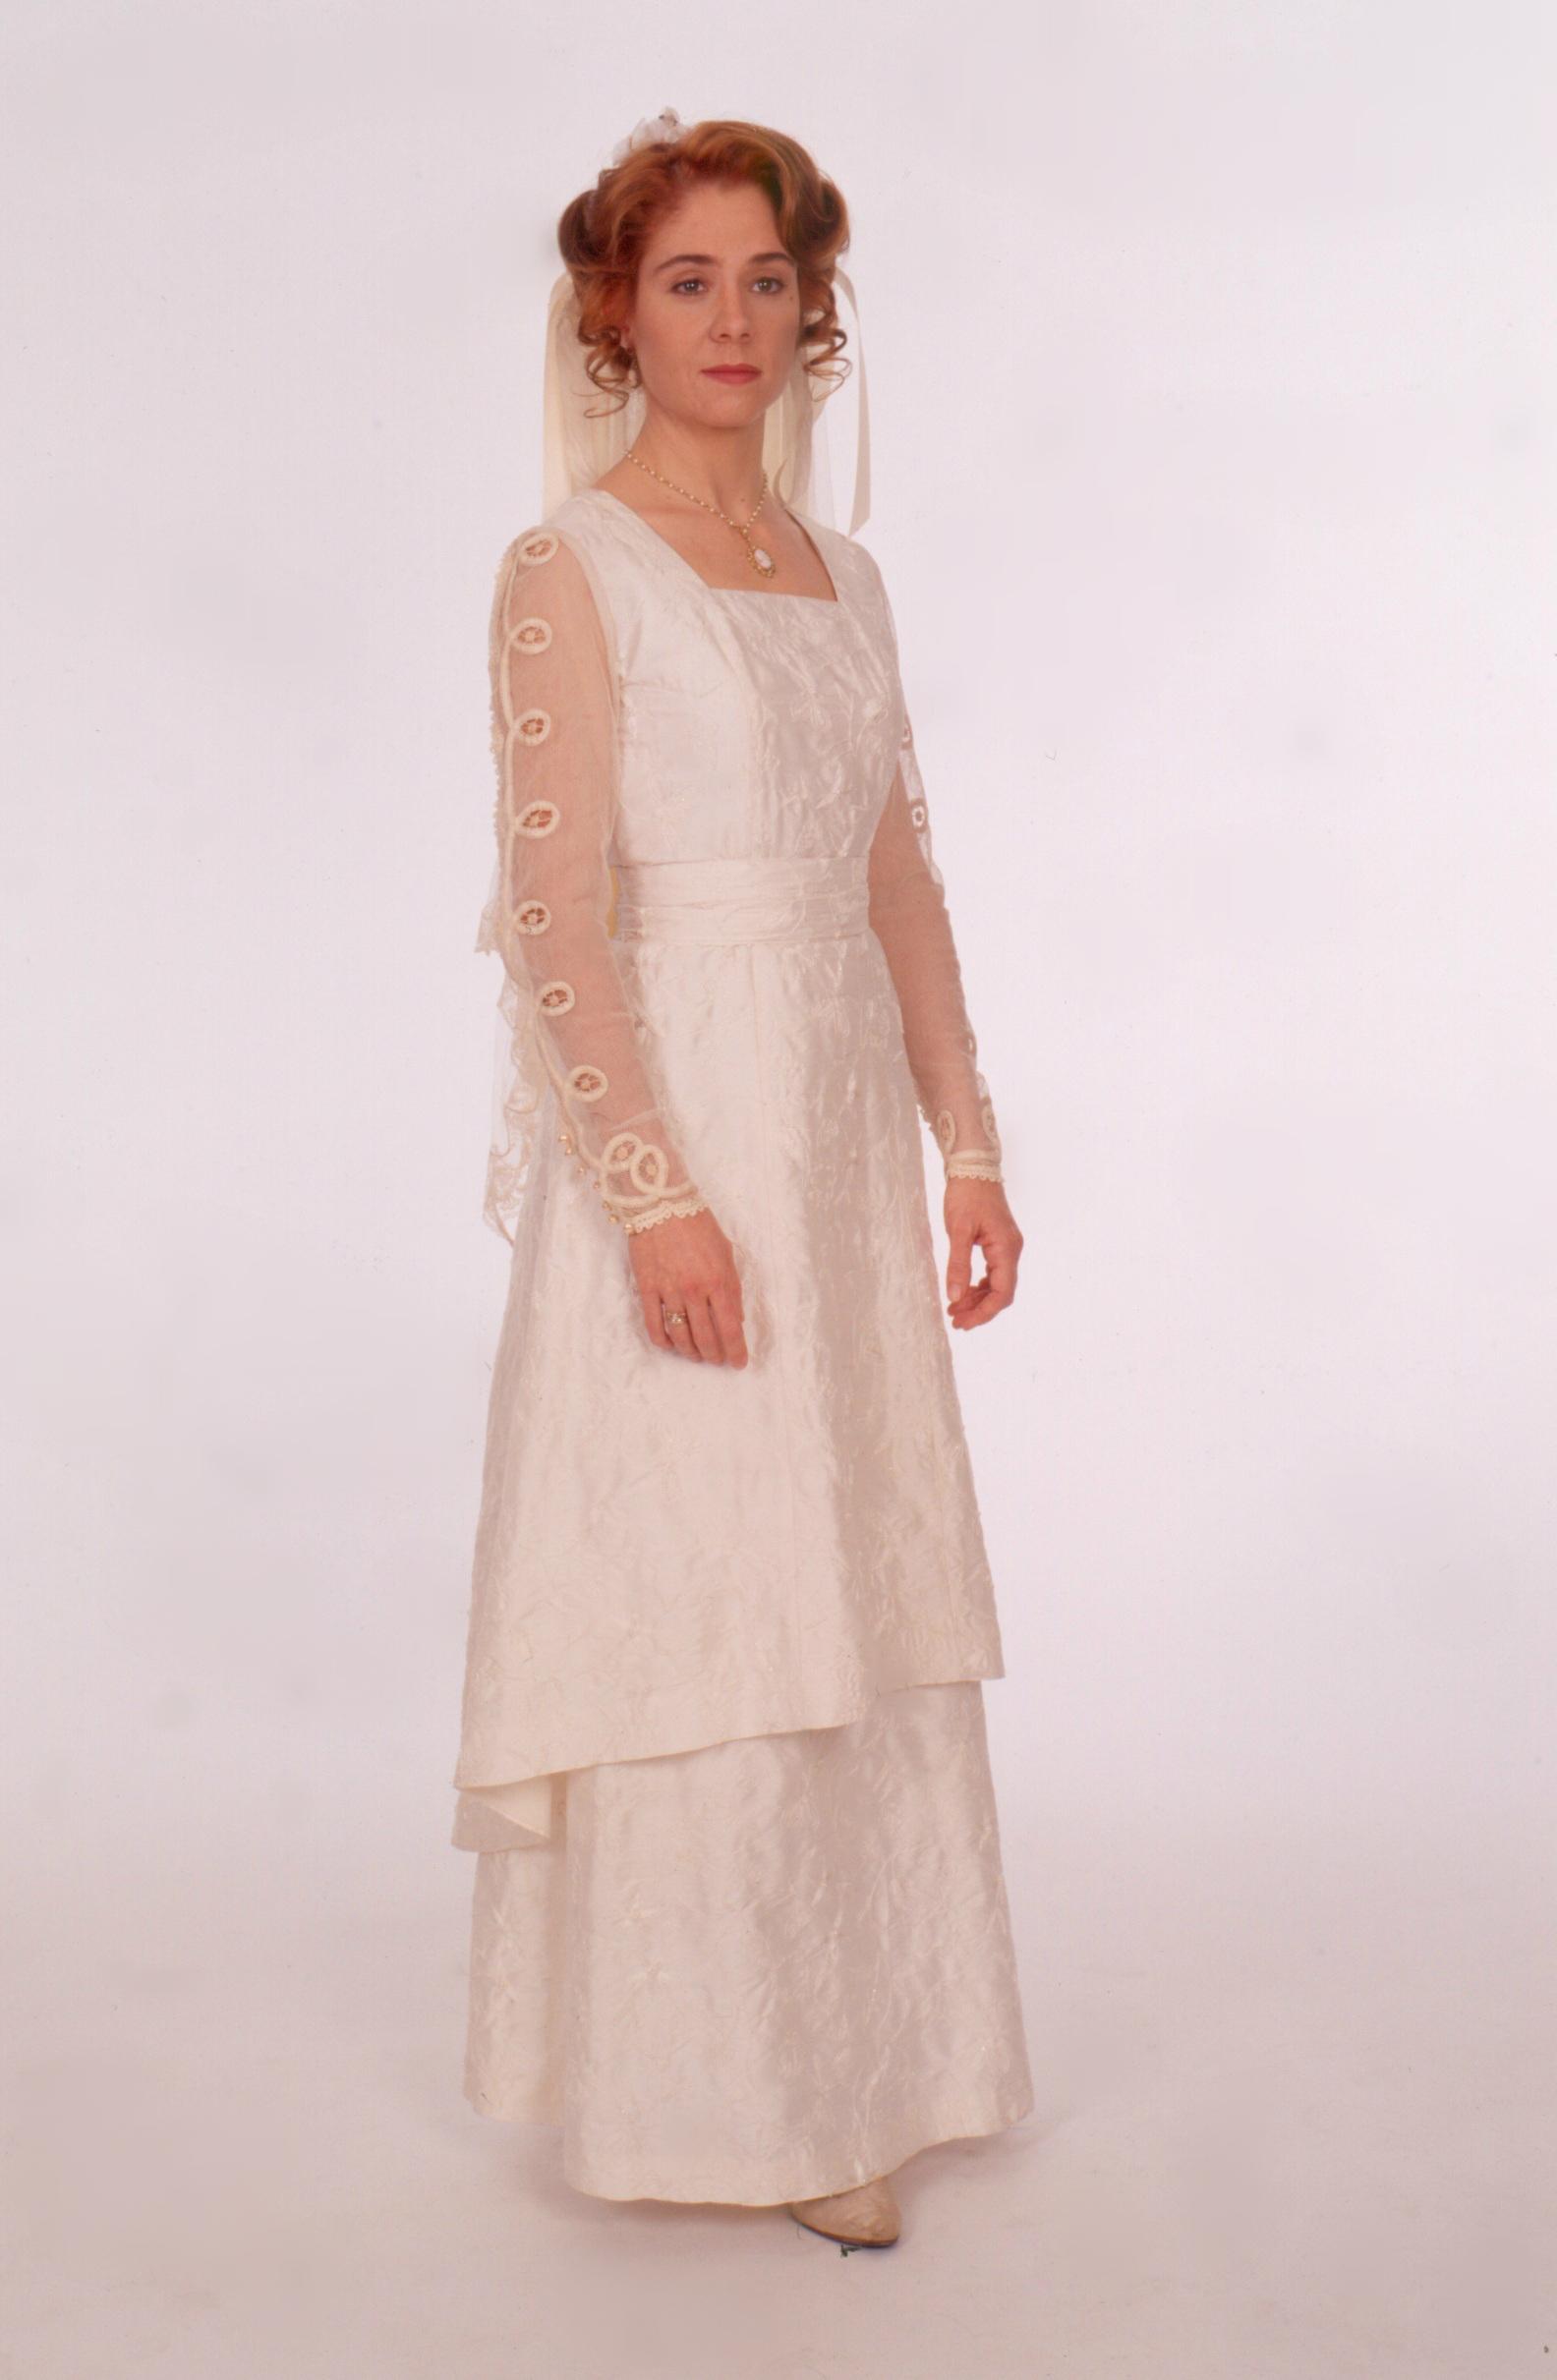 anne of green gables wedding dresses photo - 1